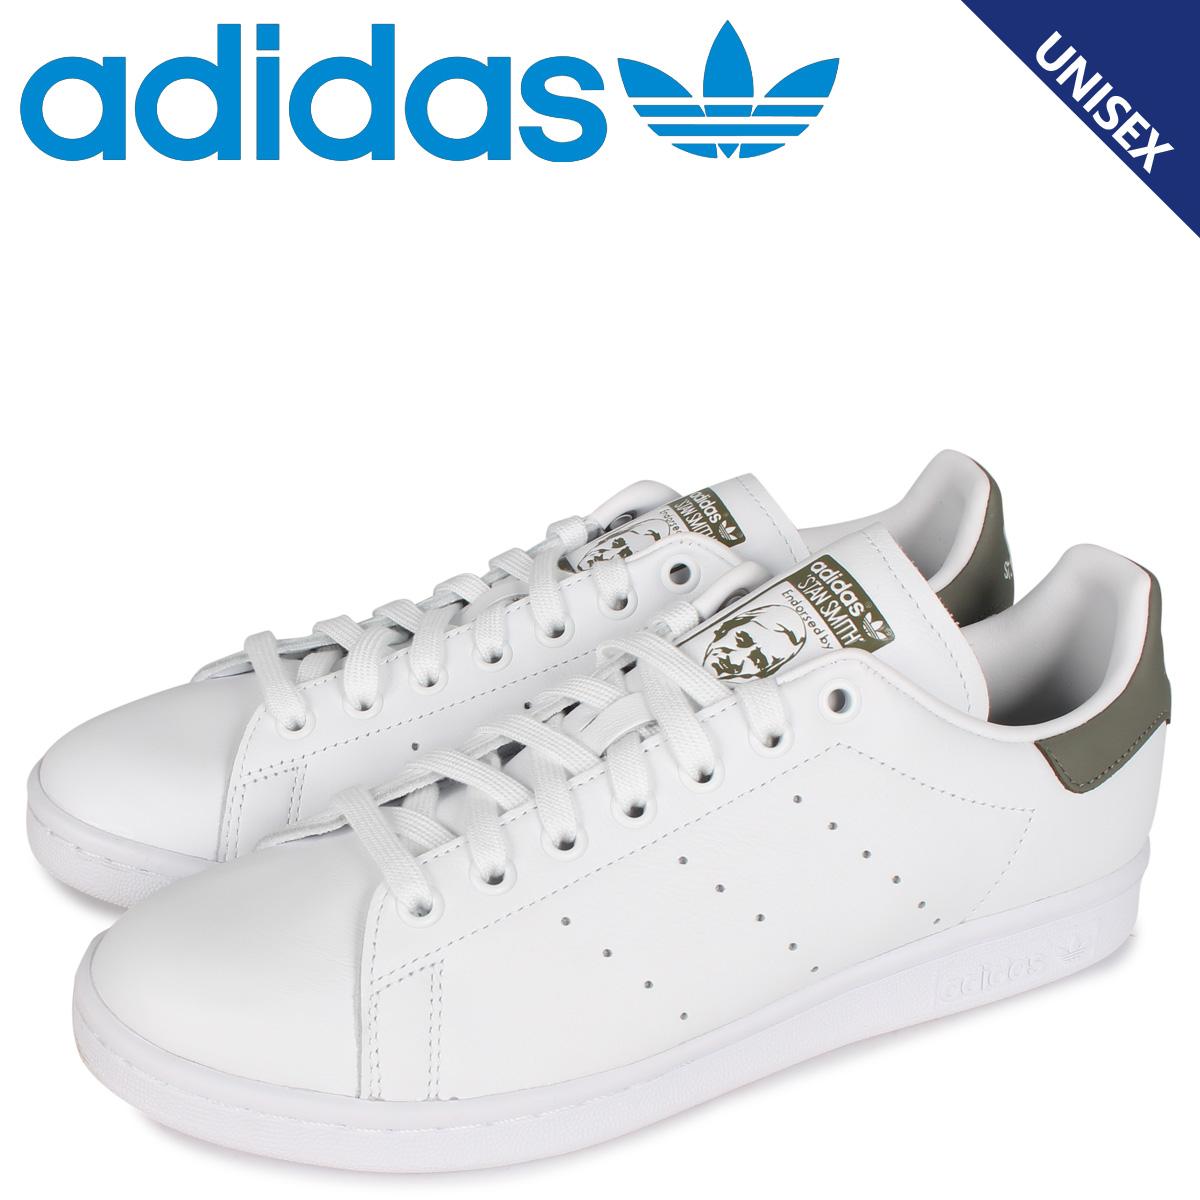 adidas Originals アディダス オリジナルス スタンスミス スニーカー メンズ レディース STAN SMITH ホワイト 白 EF4479 [4/27 新入荷]